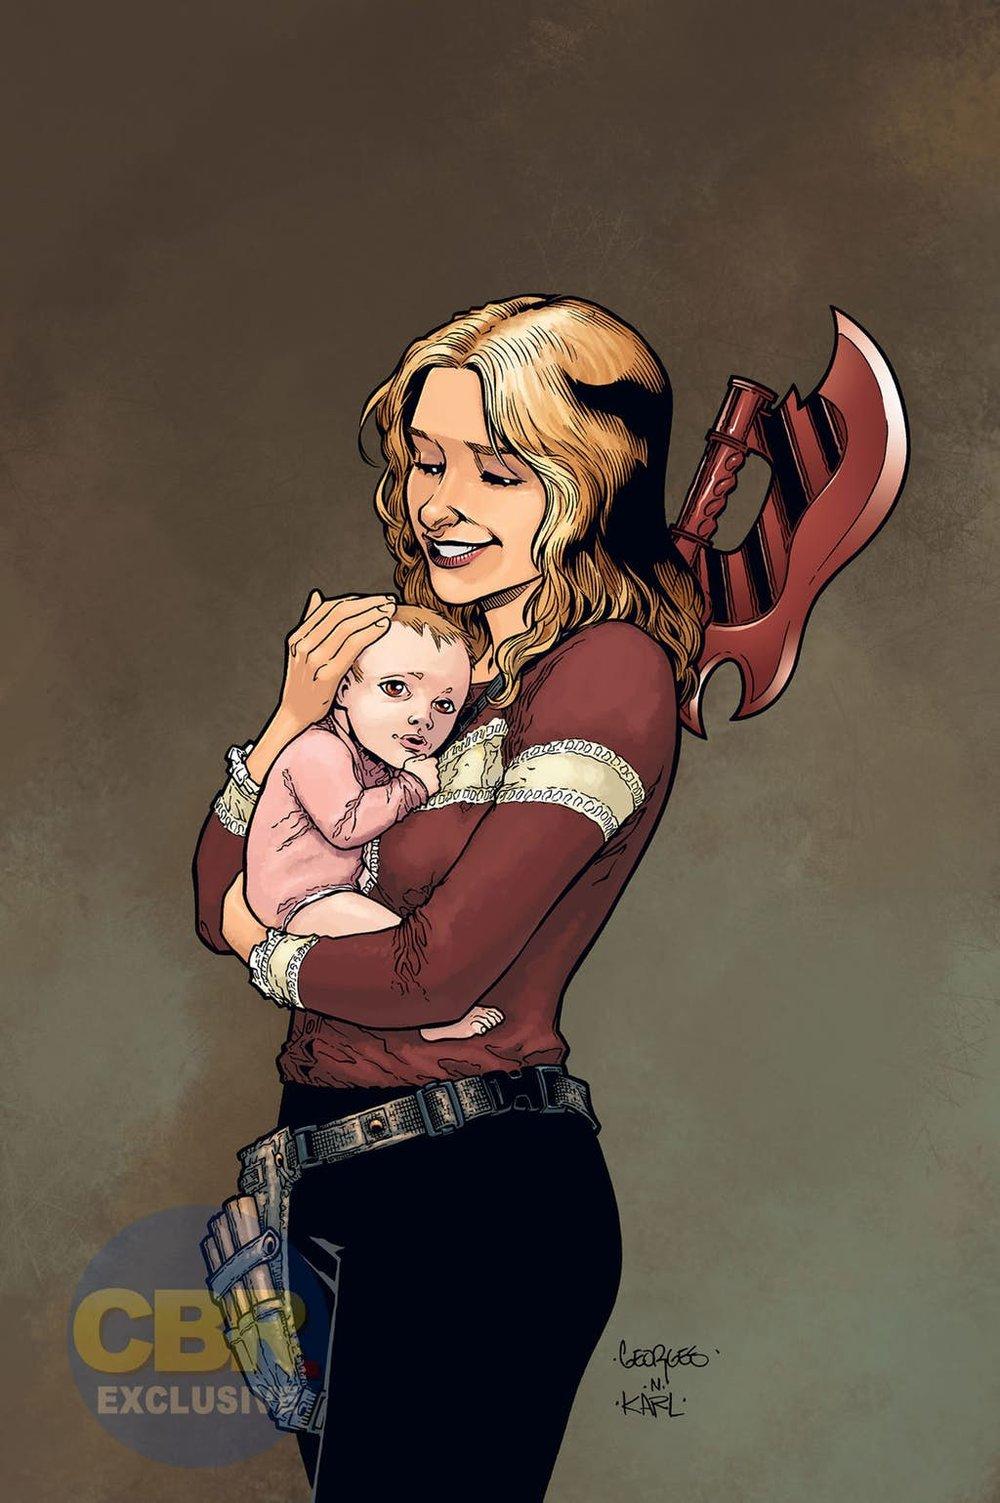 joss-whedon-returns-to-buffy-the-vampire-slayer-for-season-12-comic3